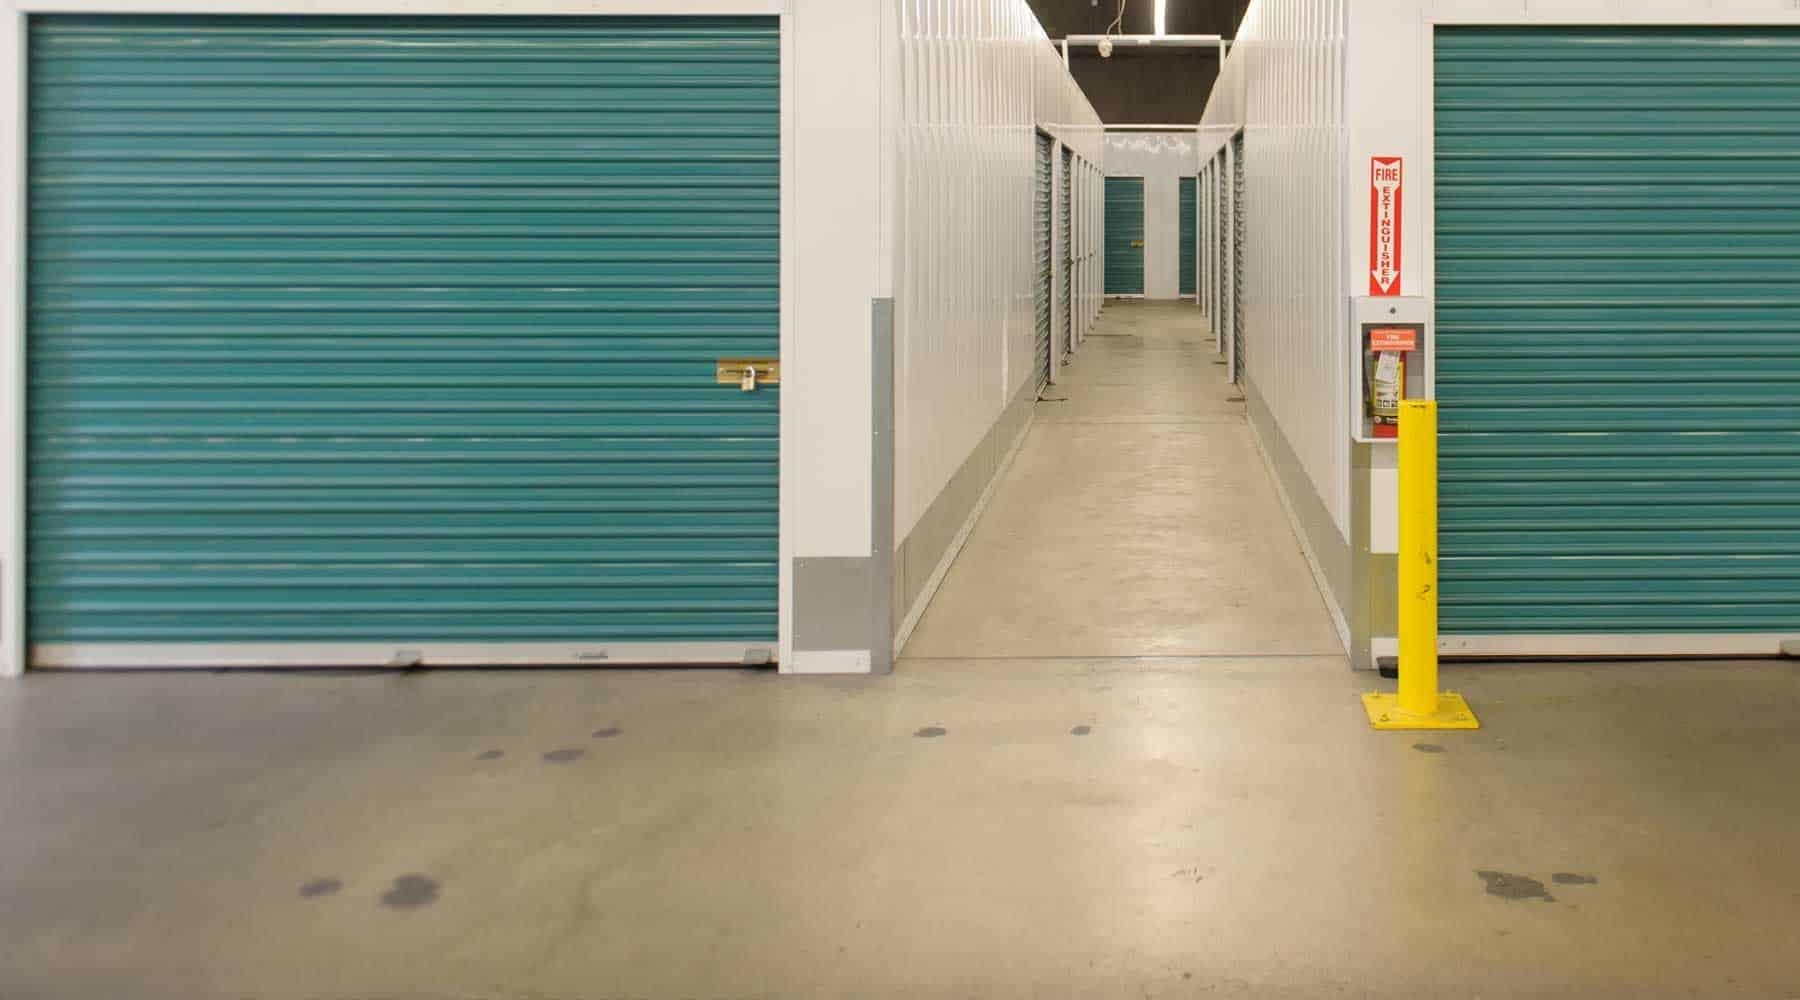 Sacramento storage drive-up storage